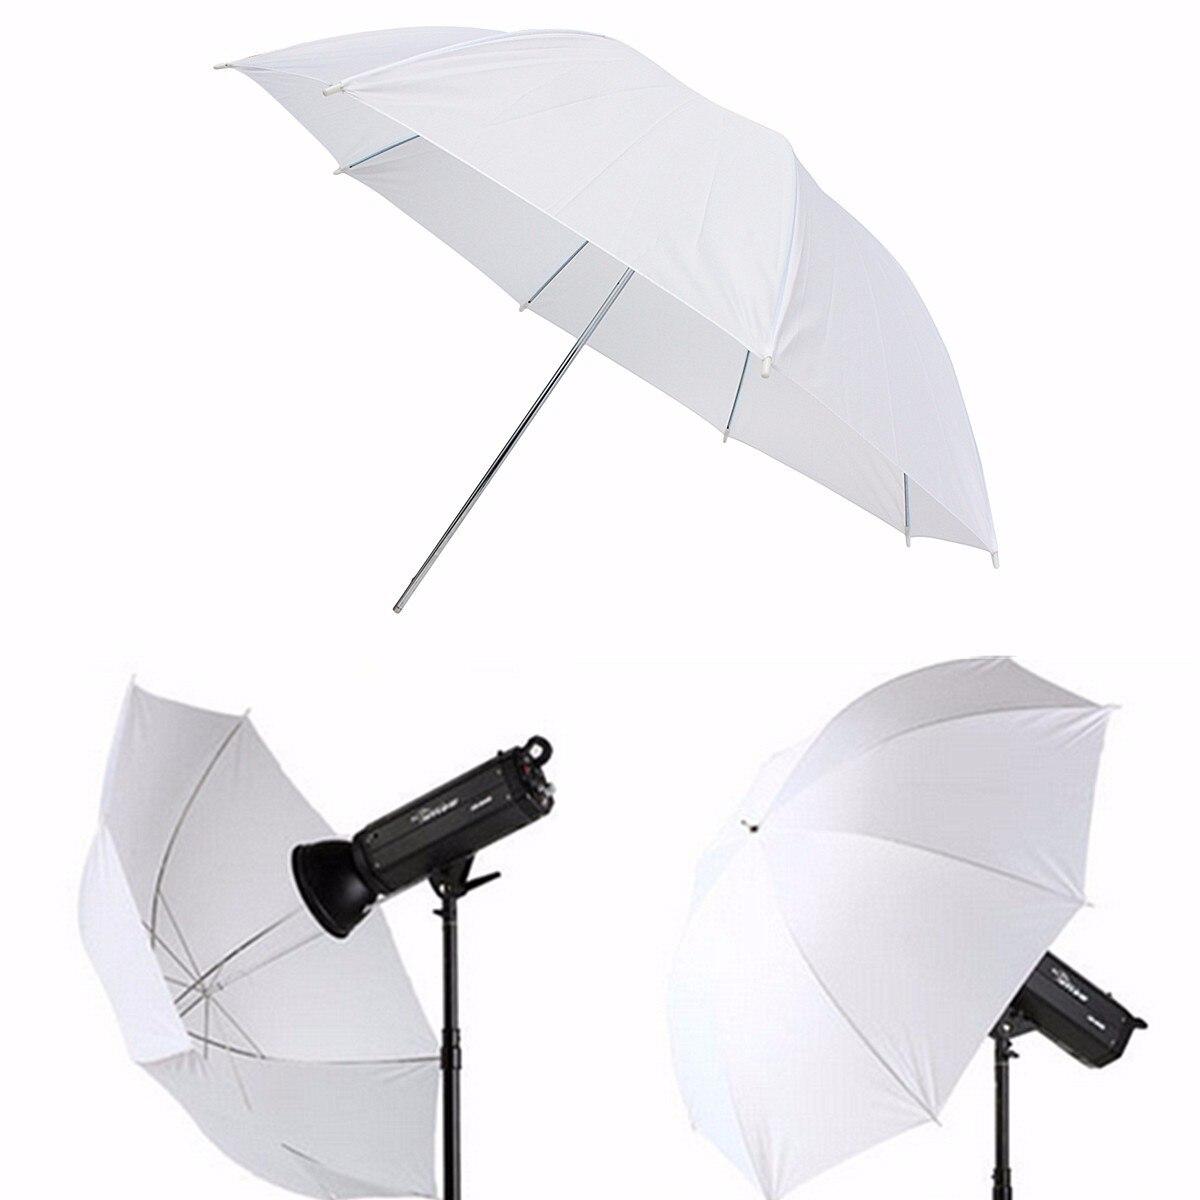 43 inch Photography Studio Video Photo Light Umbrella White Translucent Diffuser flash Soft Umbrella Accessories